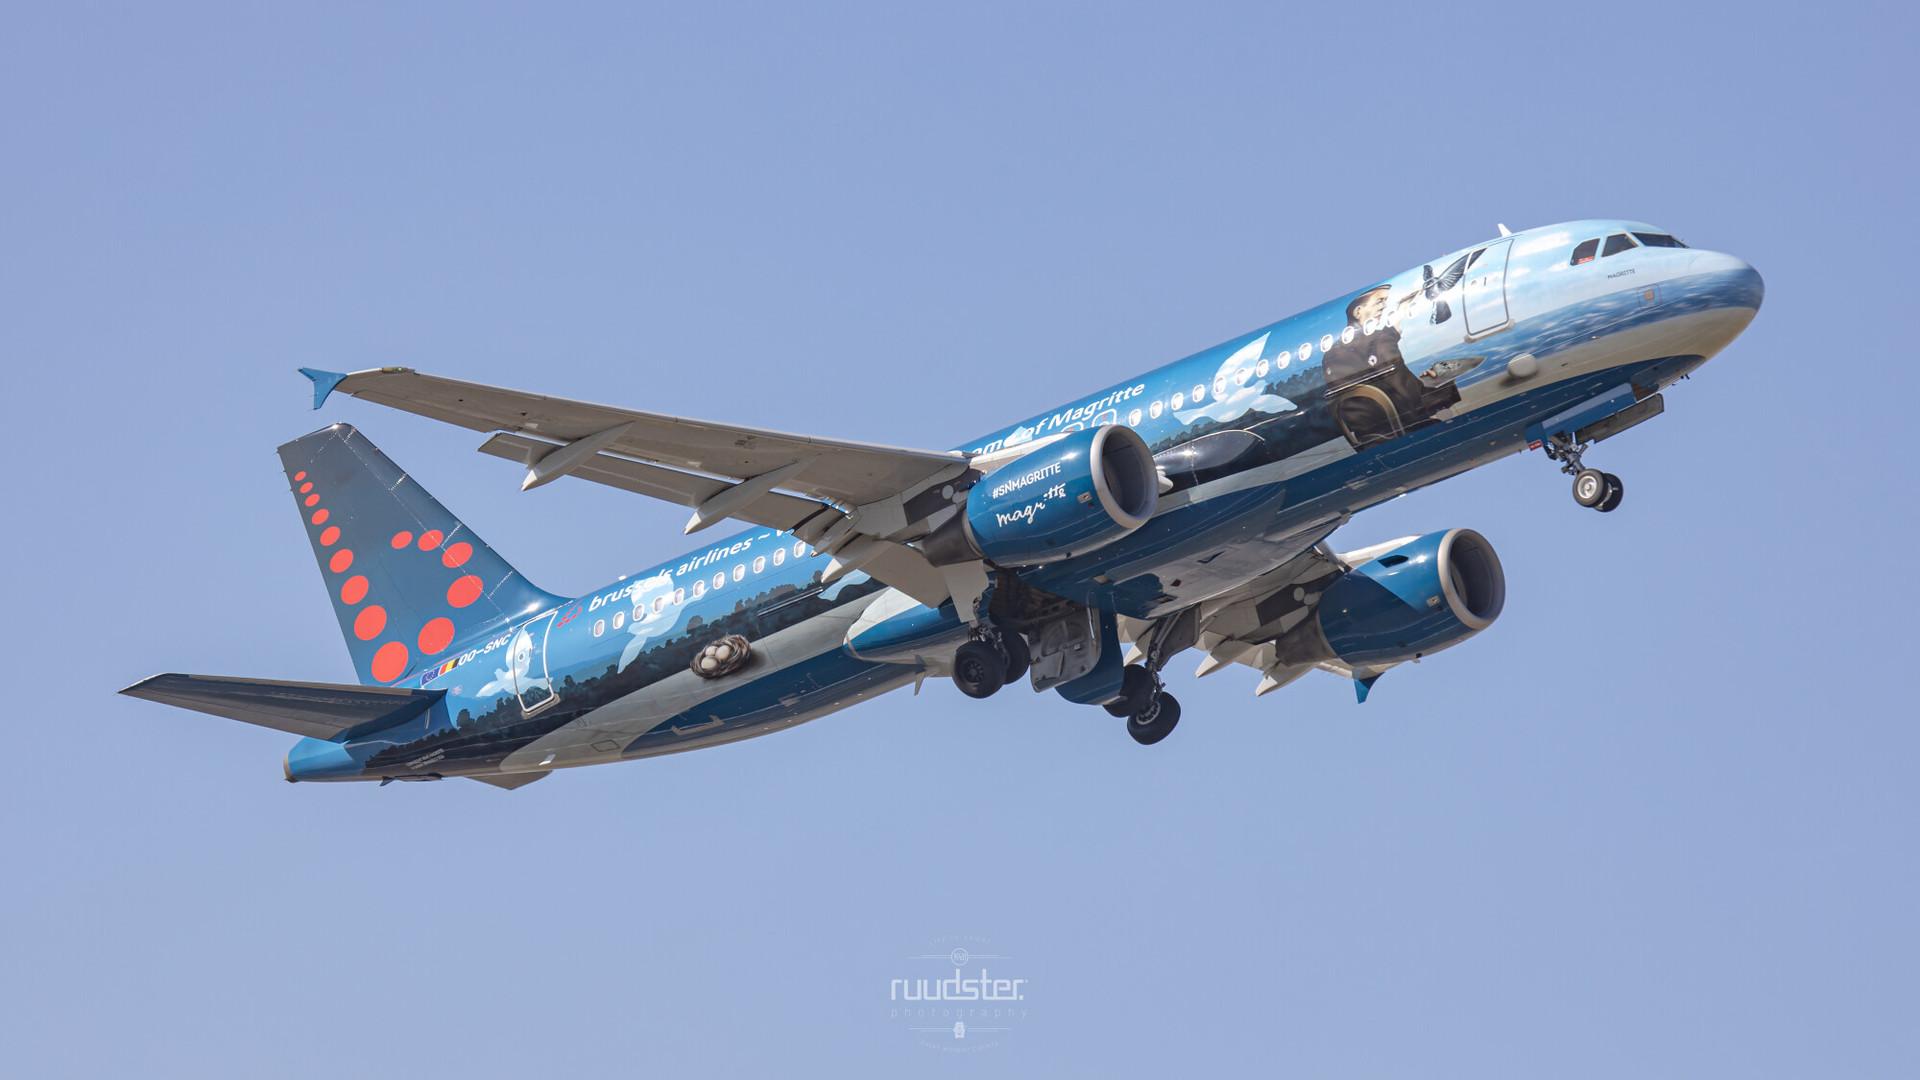 OO-SNC | Build: 2002 - Airbus A320-214